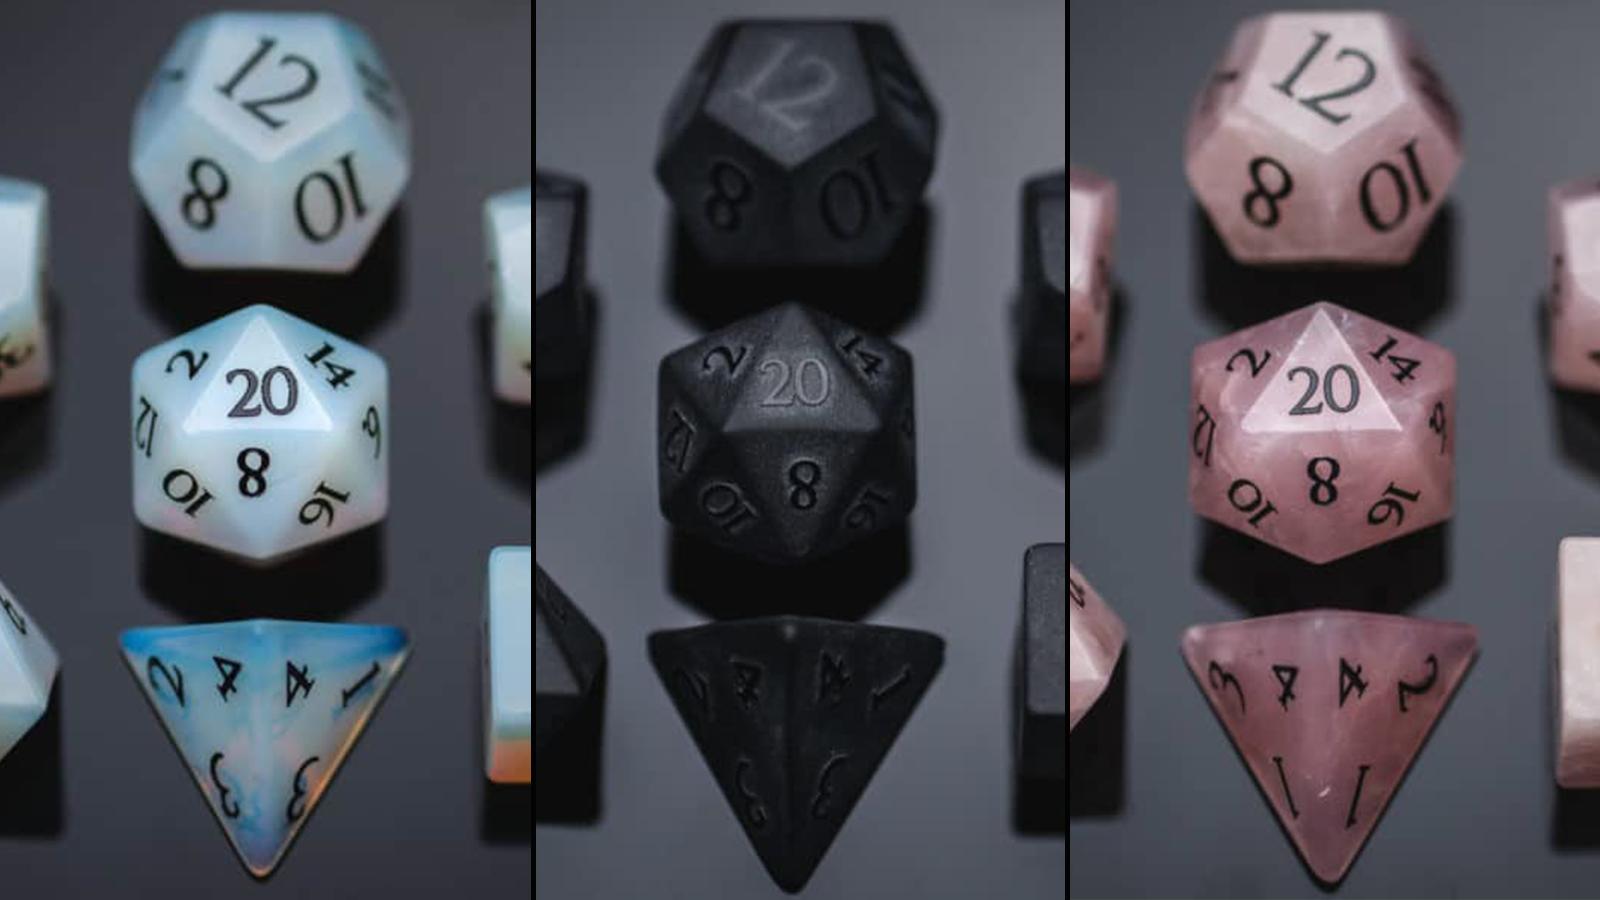 Three pairs of Wyrmwood dice